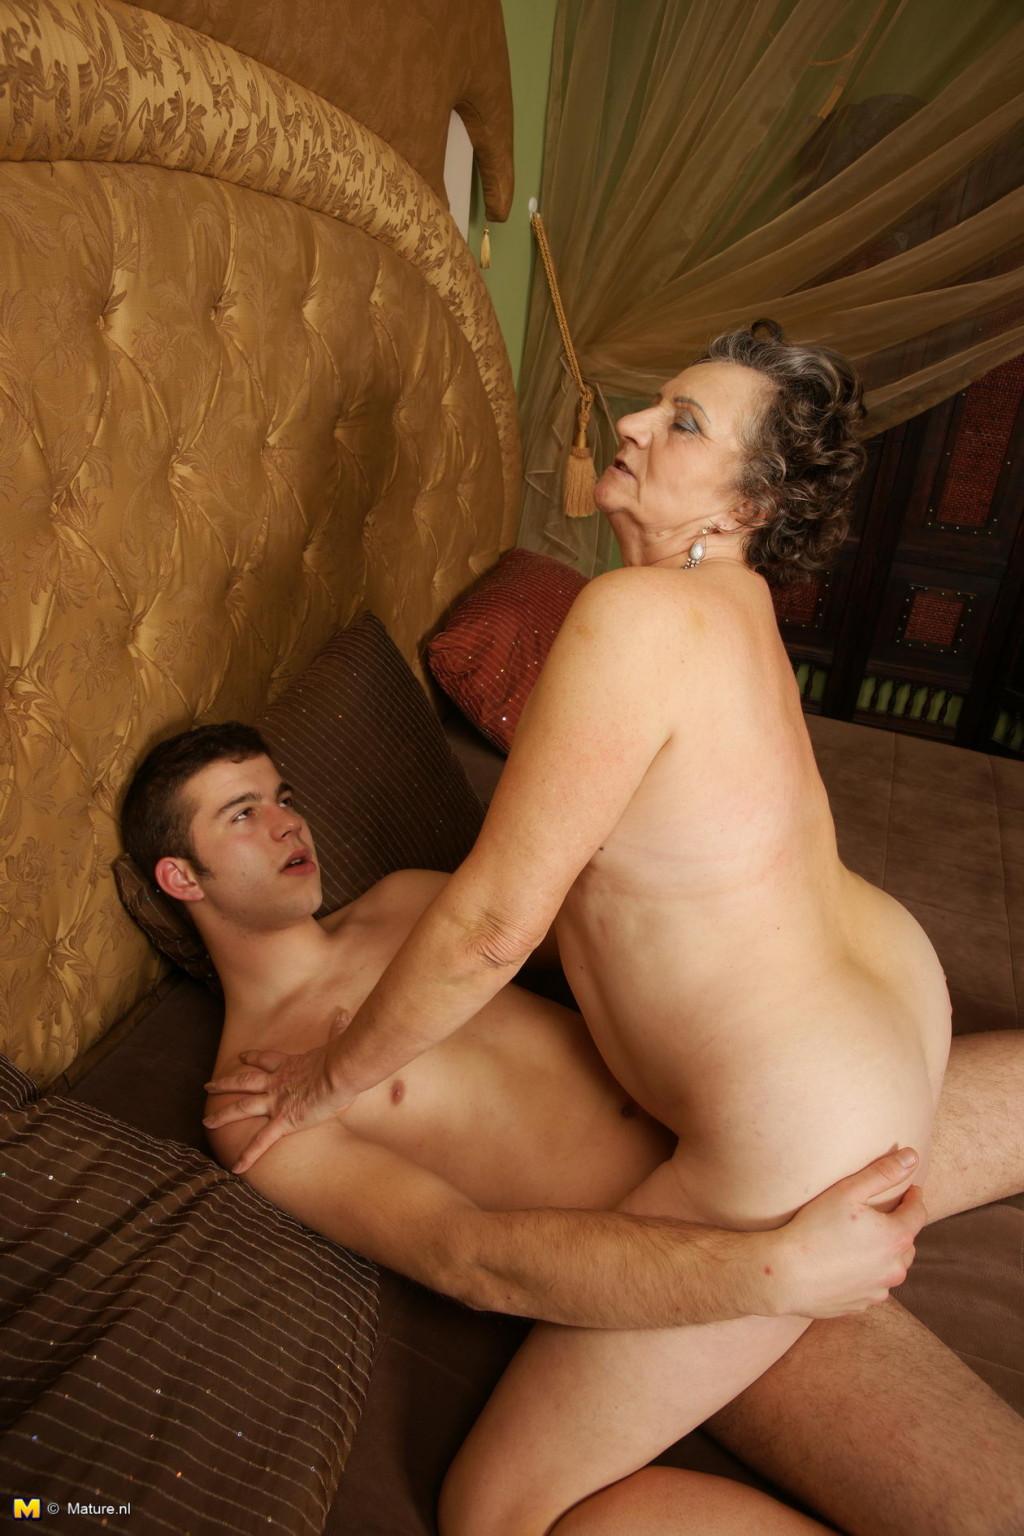 Woman boy erotic stories